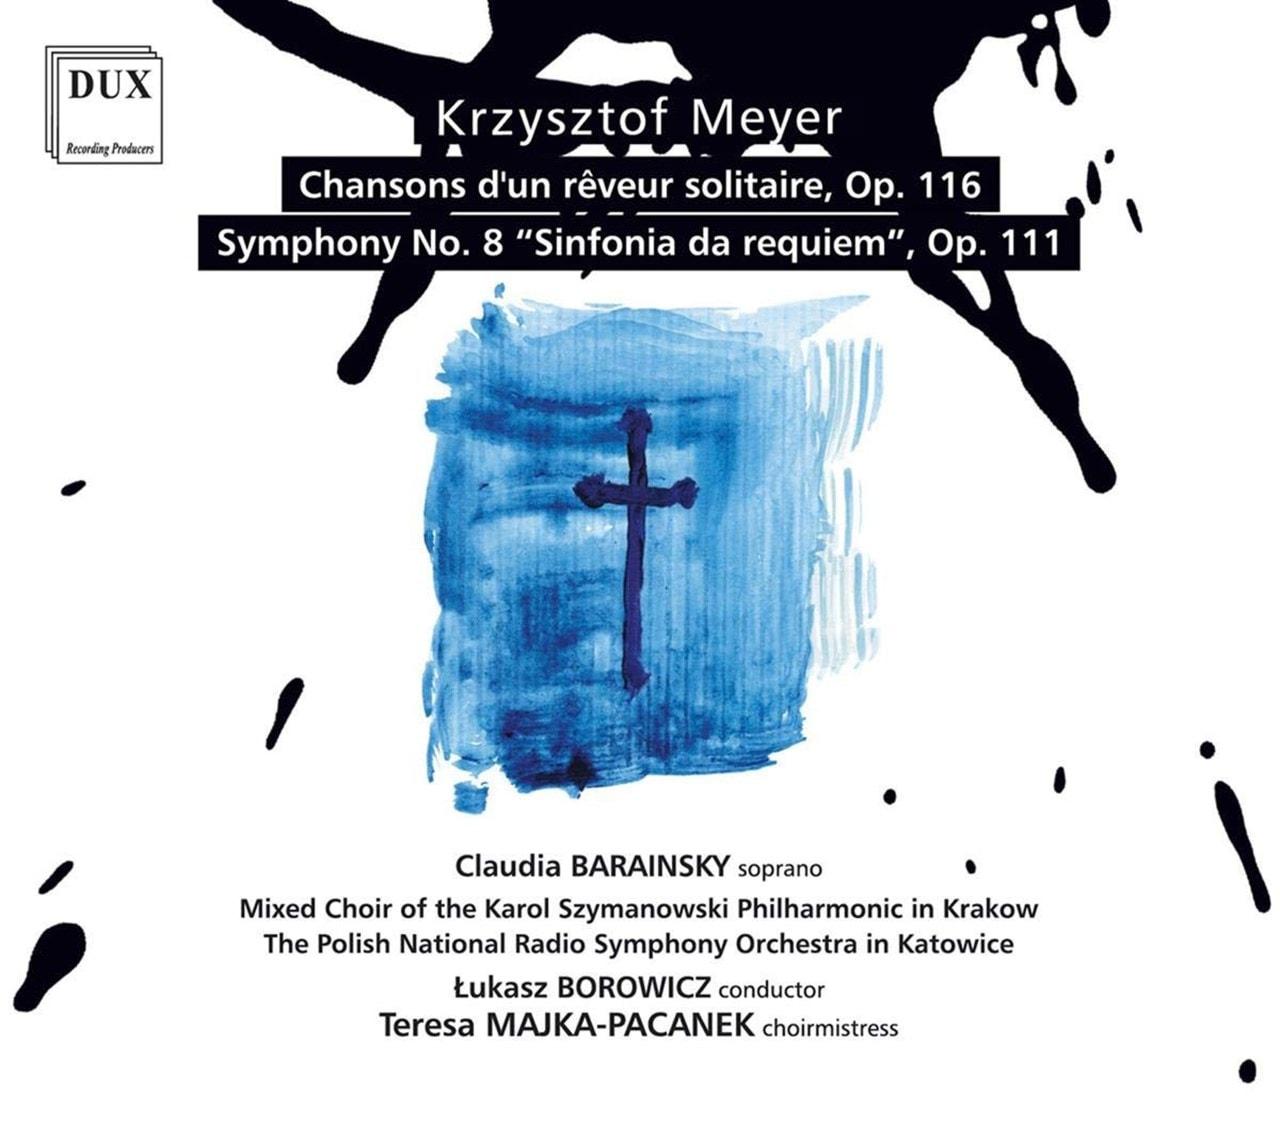 Krzysztof Meyer: Chansons D'un Reveur Solitaire, Op. 116/... - 1